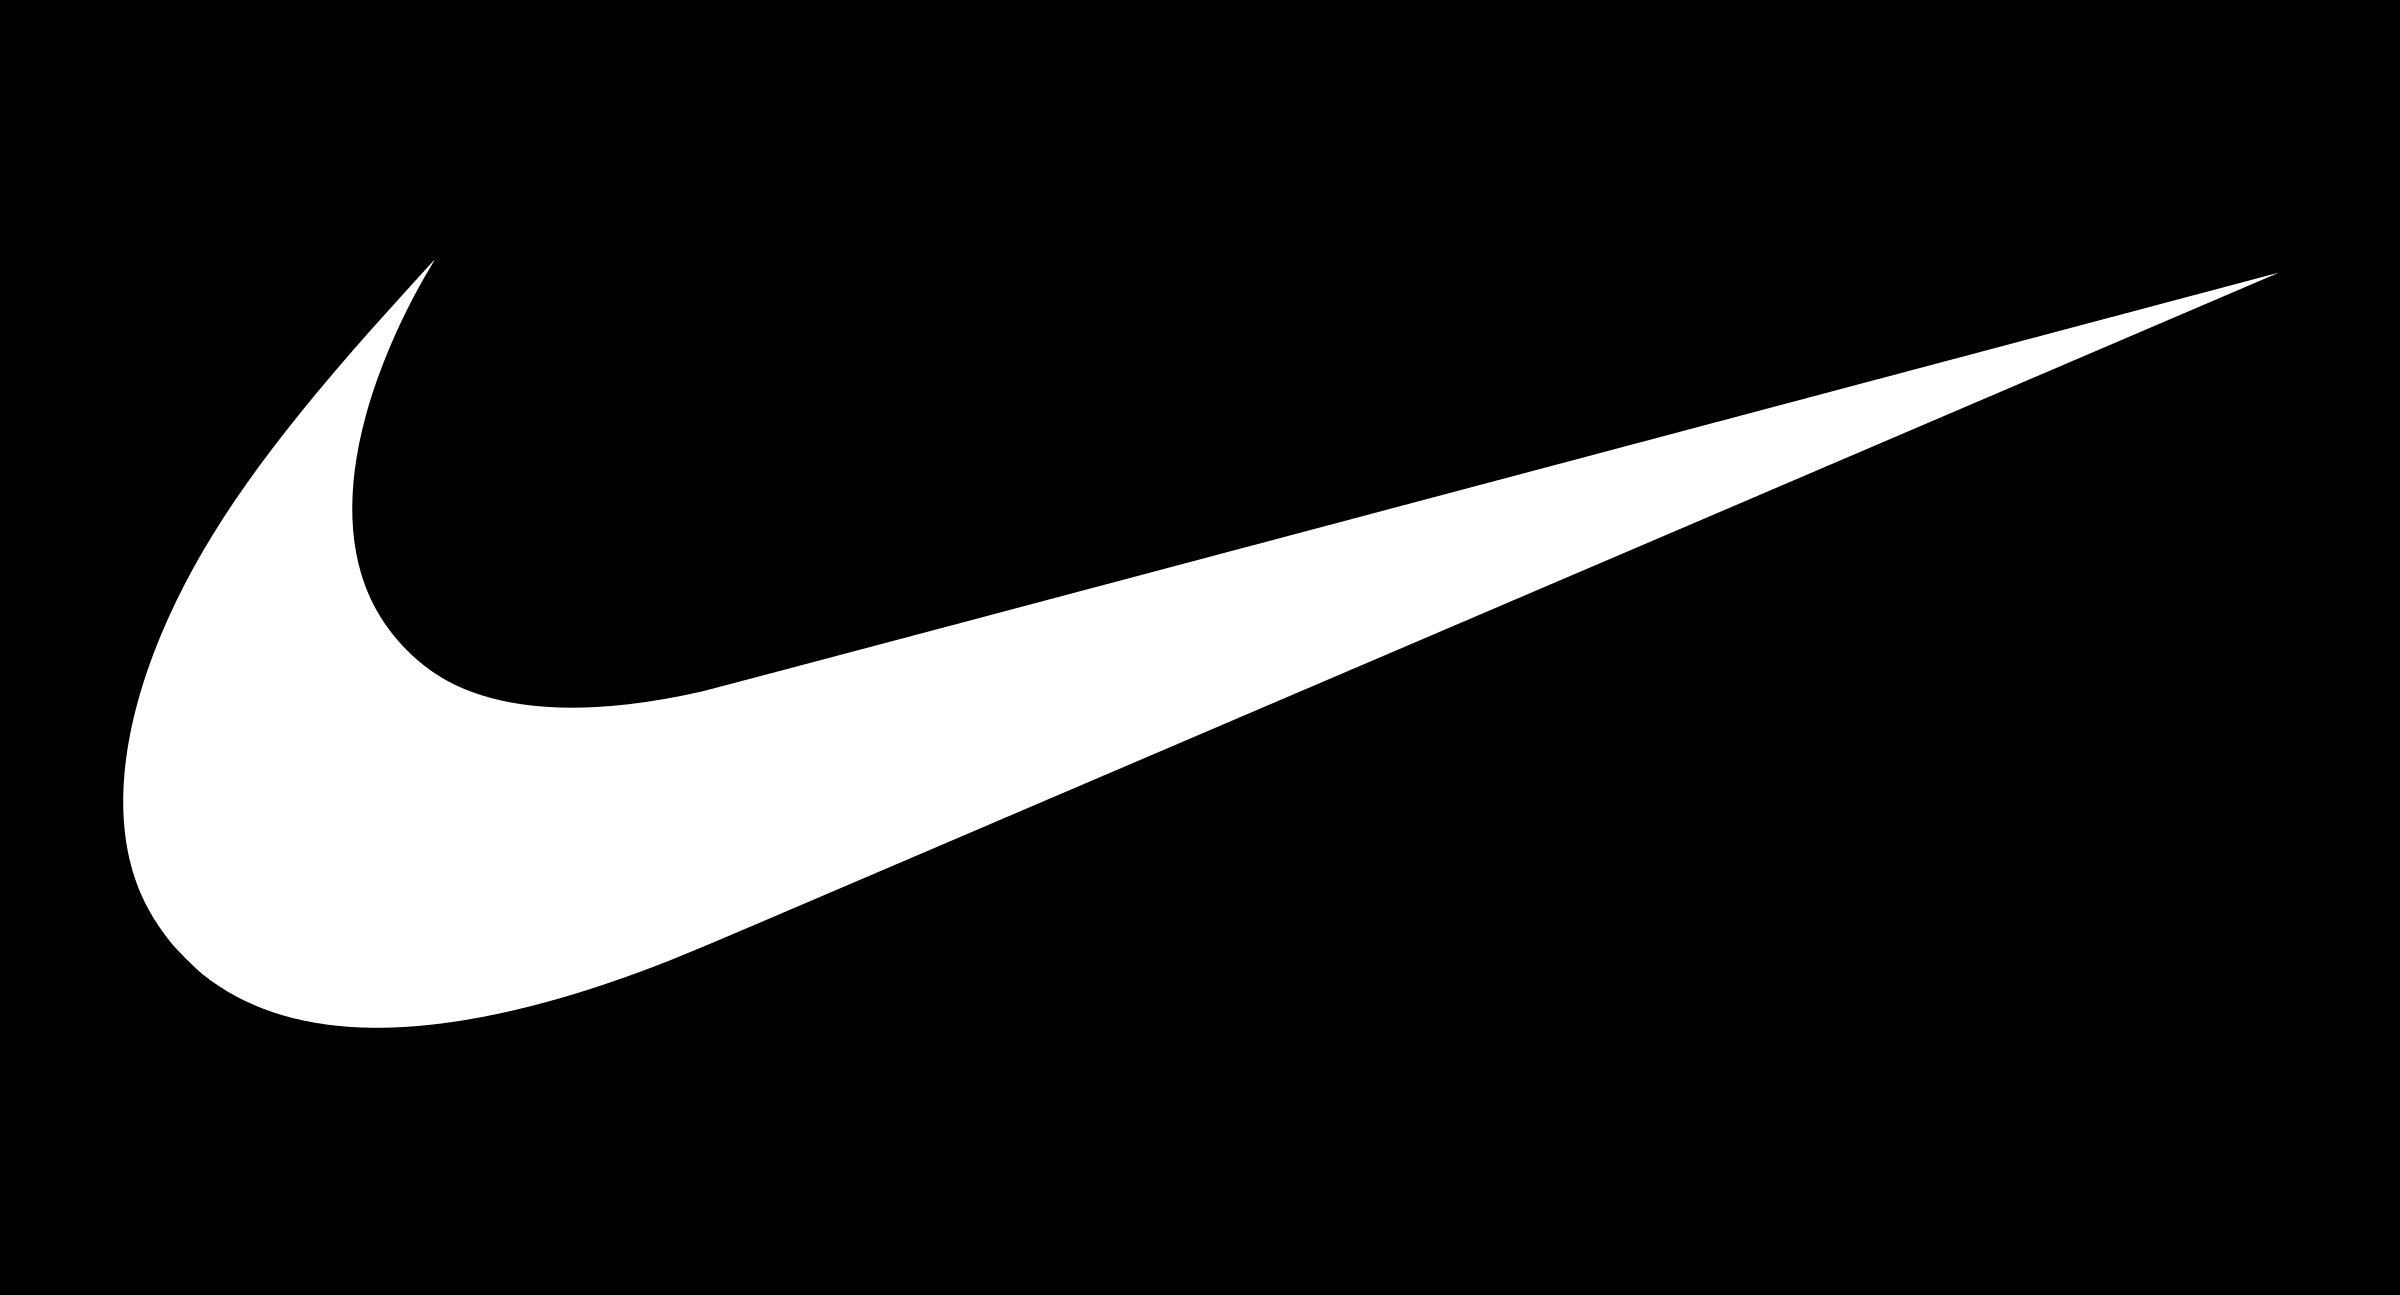 al revés doblado ira  Nike Logo White | Nike logo, Nike symbol, Nike swoosh logo